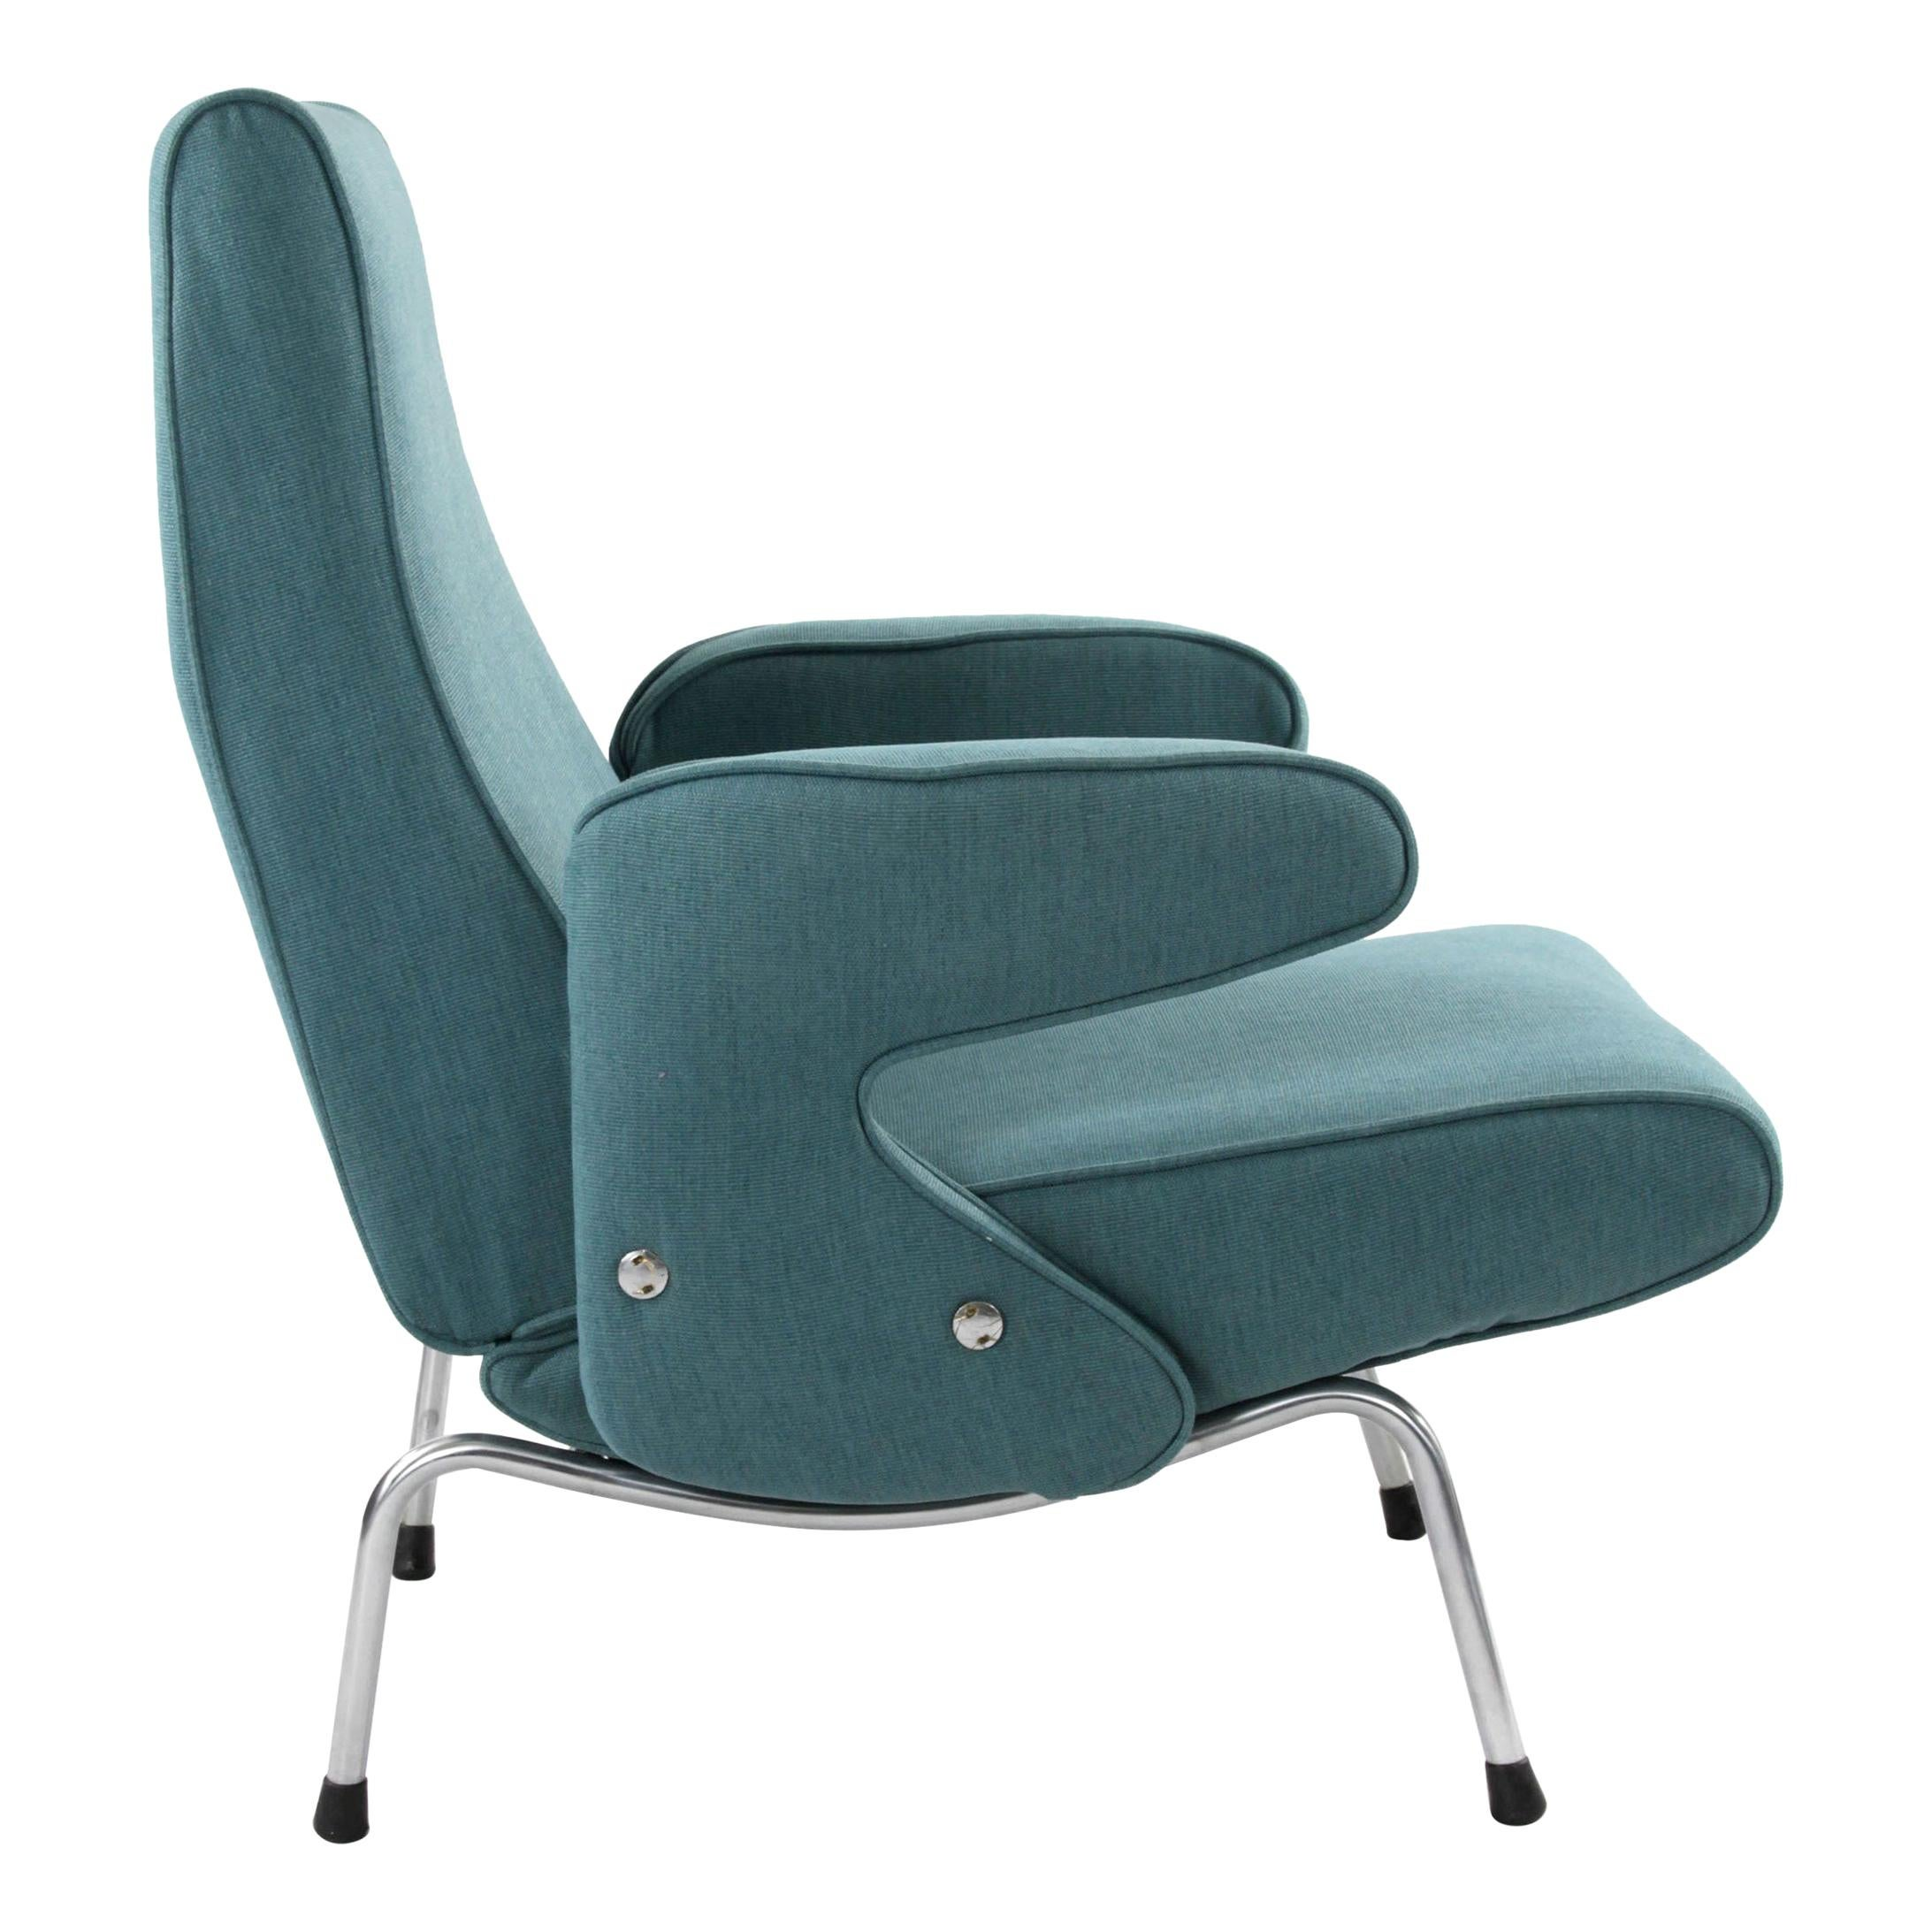 Erberto Carboni for Arflex Light Blue Delfino Chair with Chrome Legs, 1955